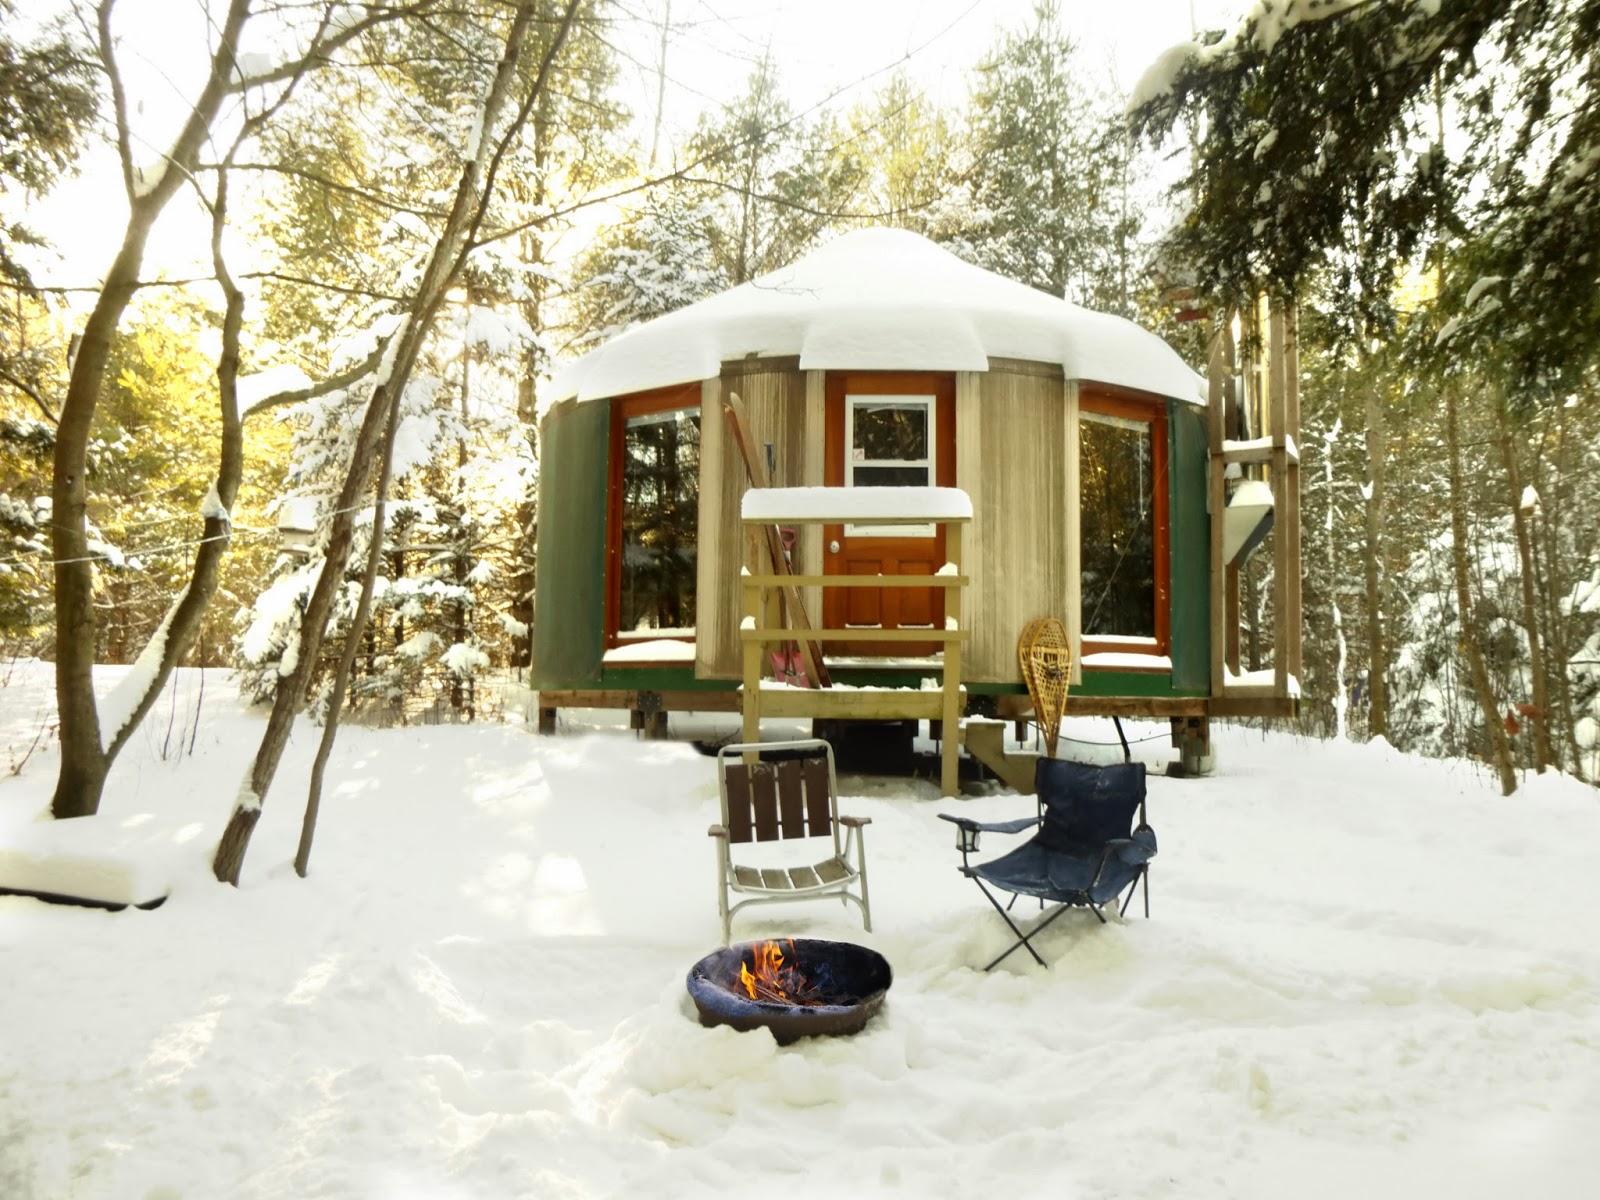 http://tourismecoaticook.qc.ca/fr/details_intervenants.php?id=165&nom=Camping%20du%20Pont%20Couvert%20-%20Yourte